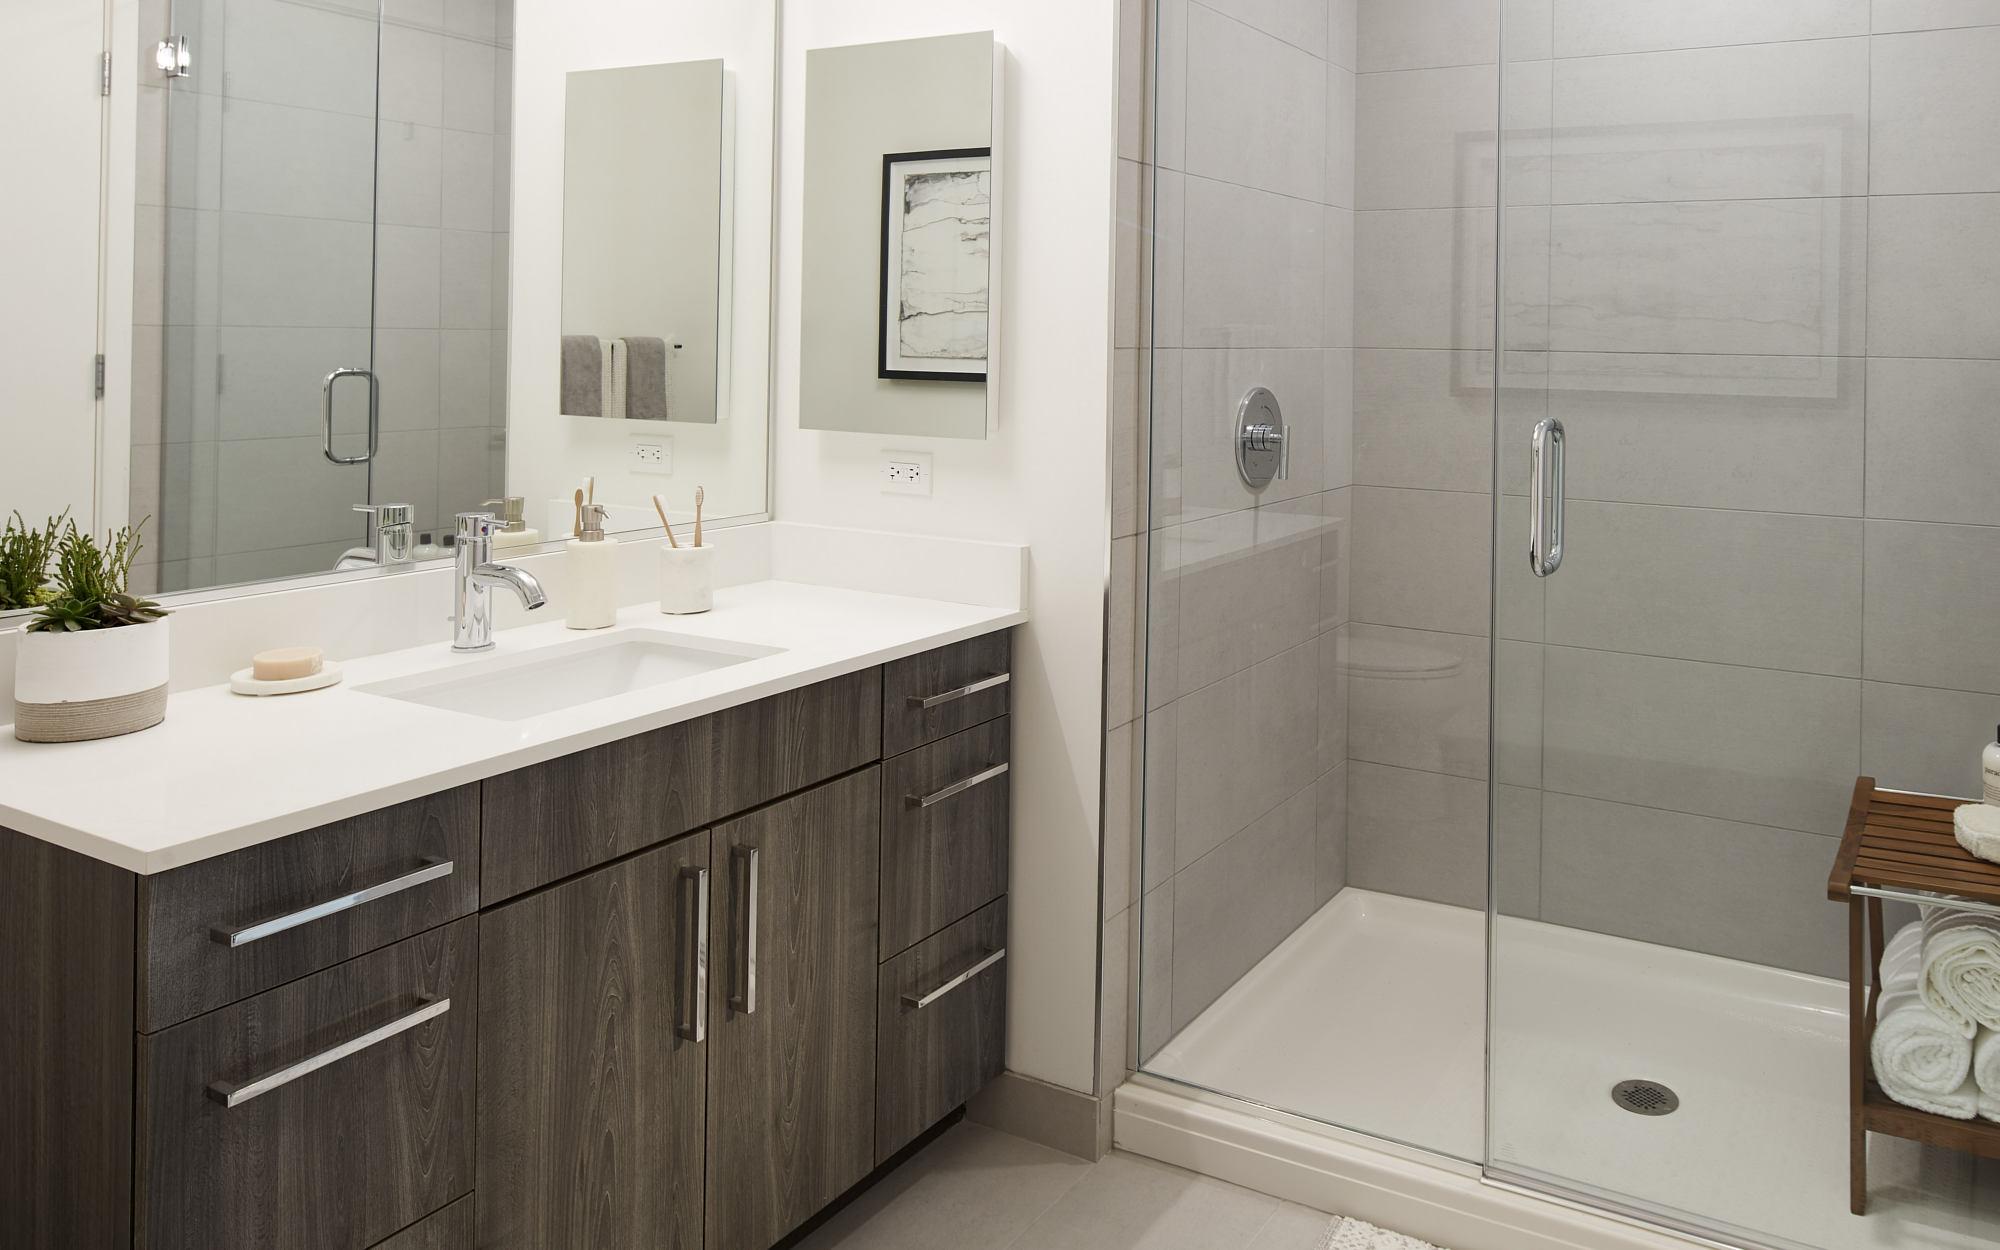 Essex model bathroom with standing steam shower